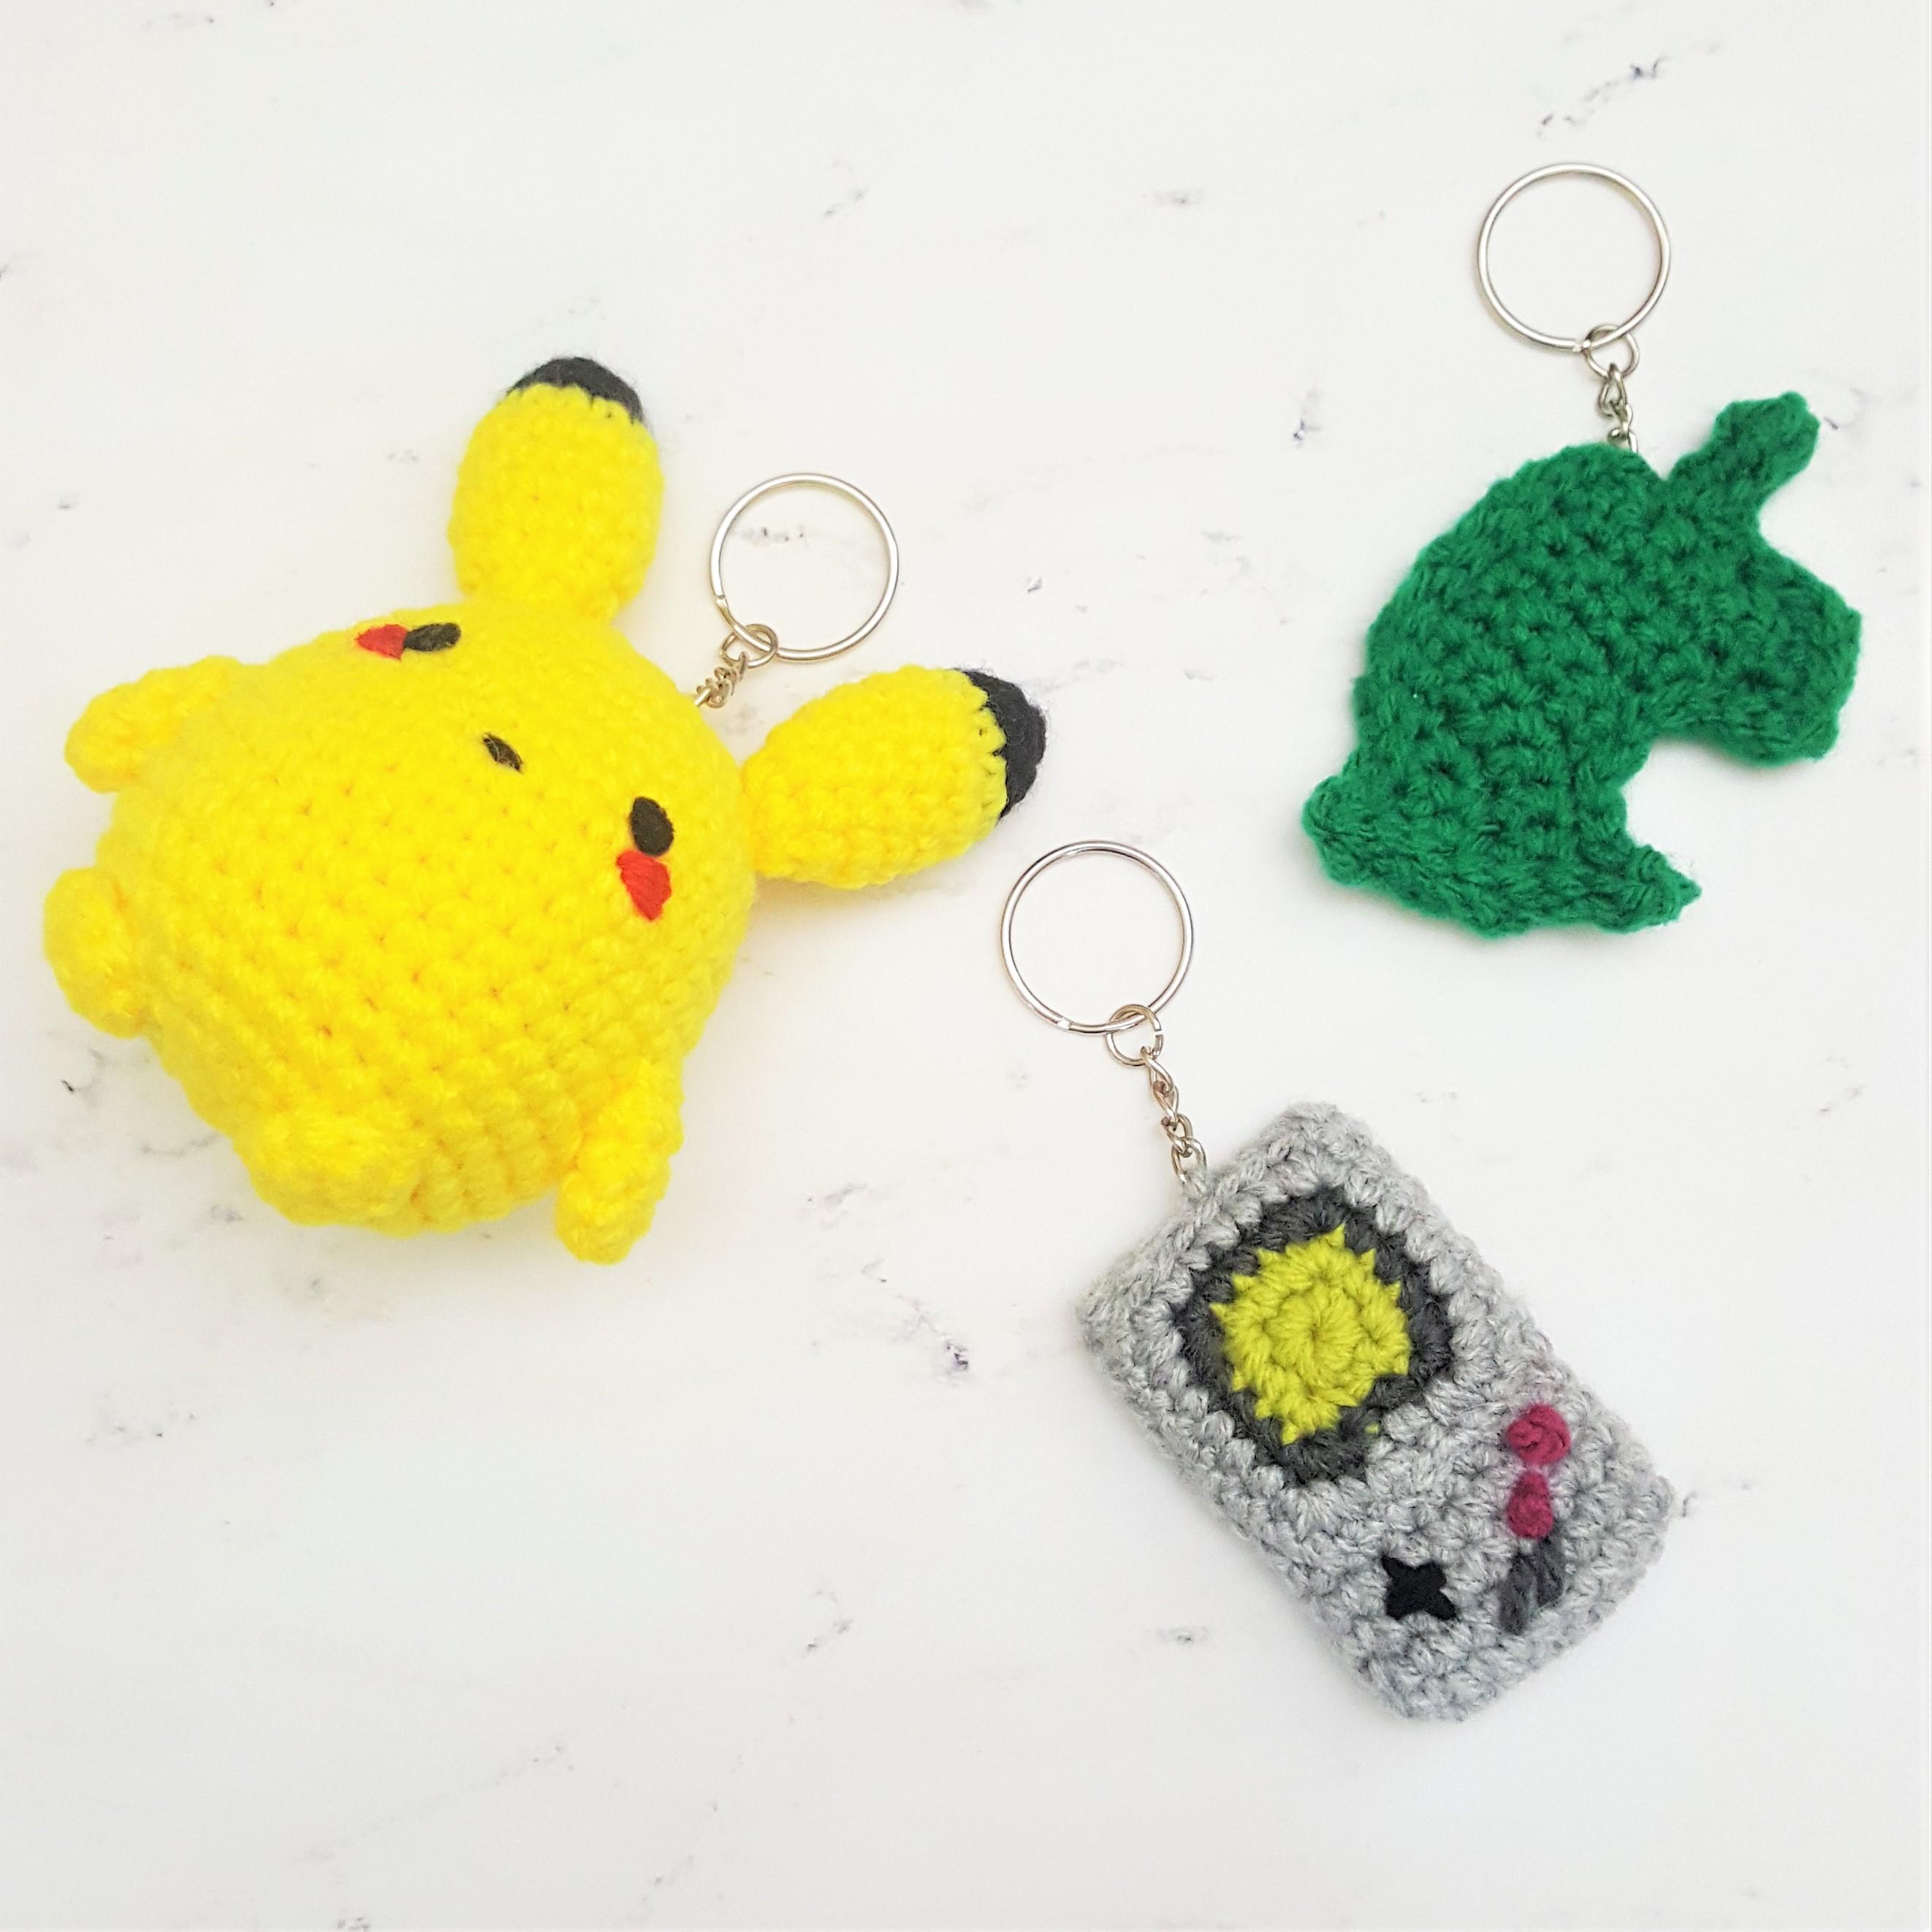 Crochet Keychain - 15 Free Crochet Patterns ⋆ DIY Crafts | 2644x2644